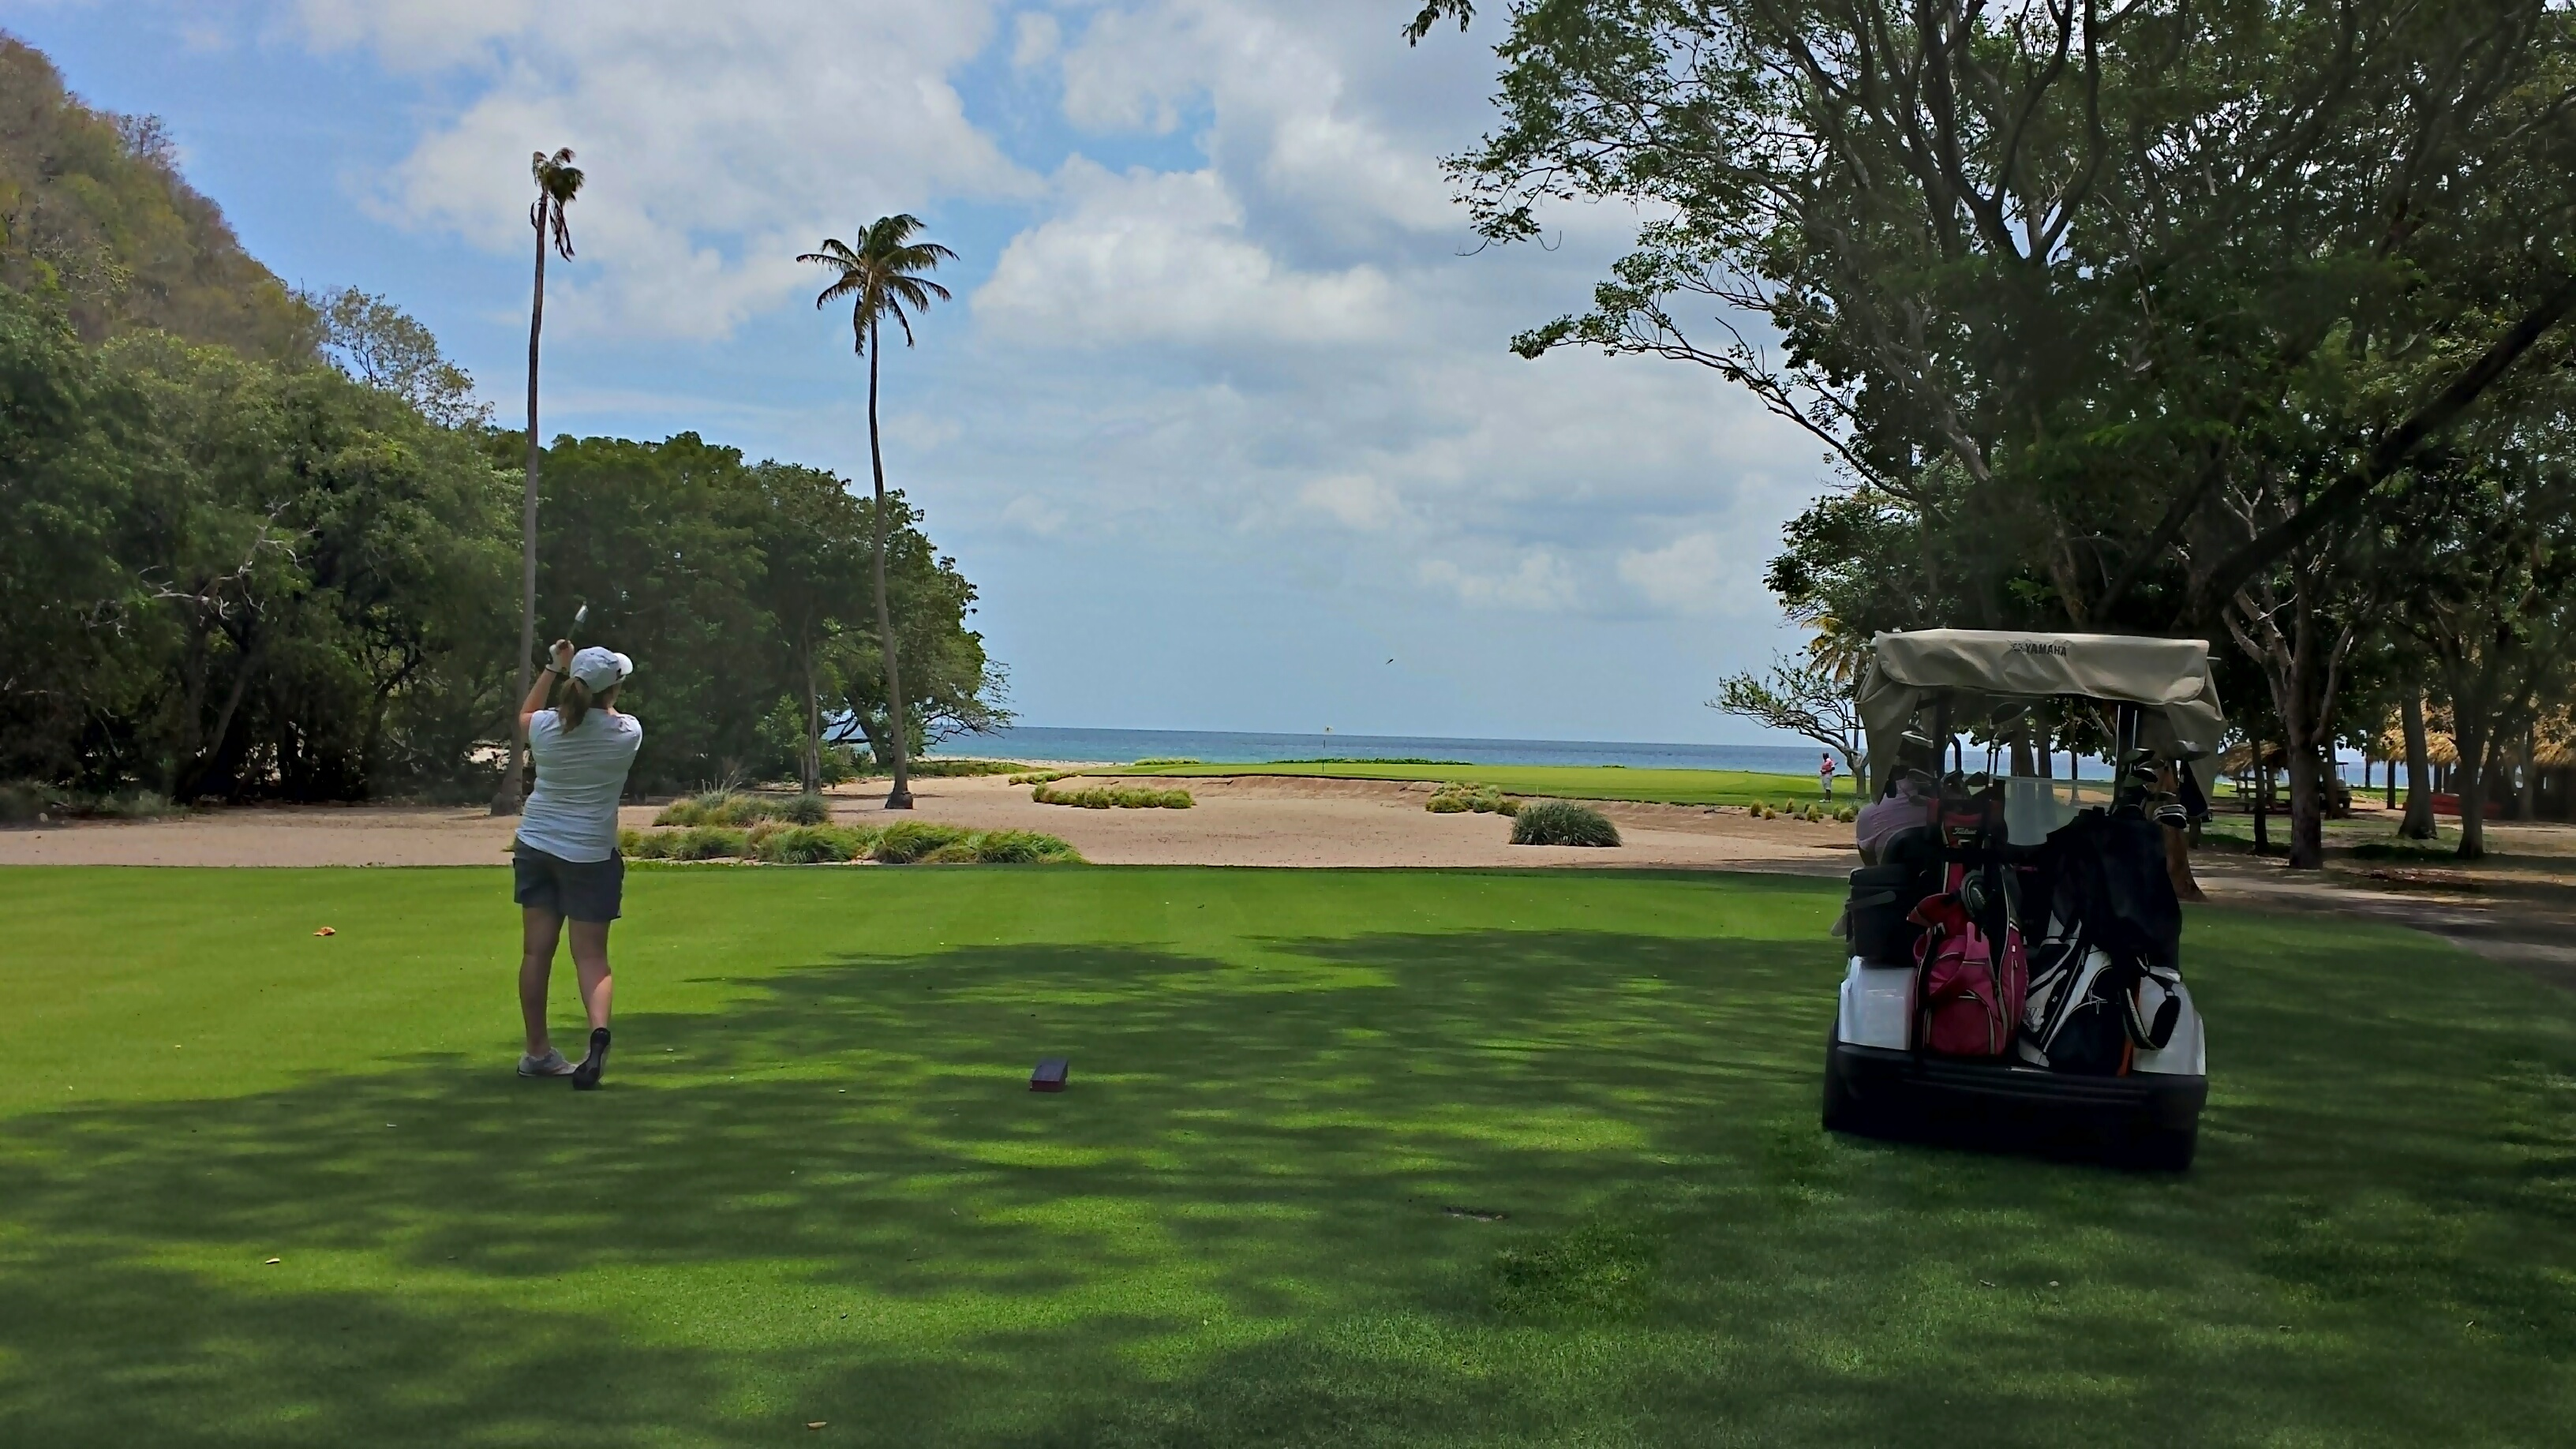 Guacalito Golf Course